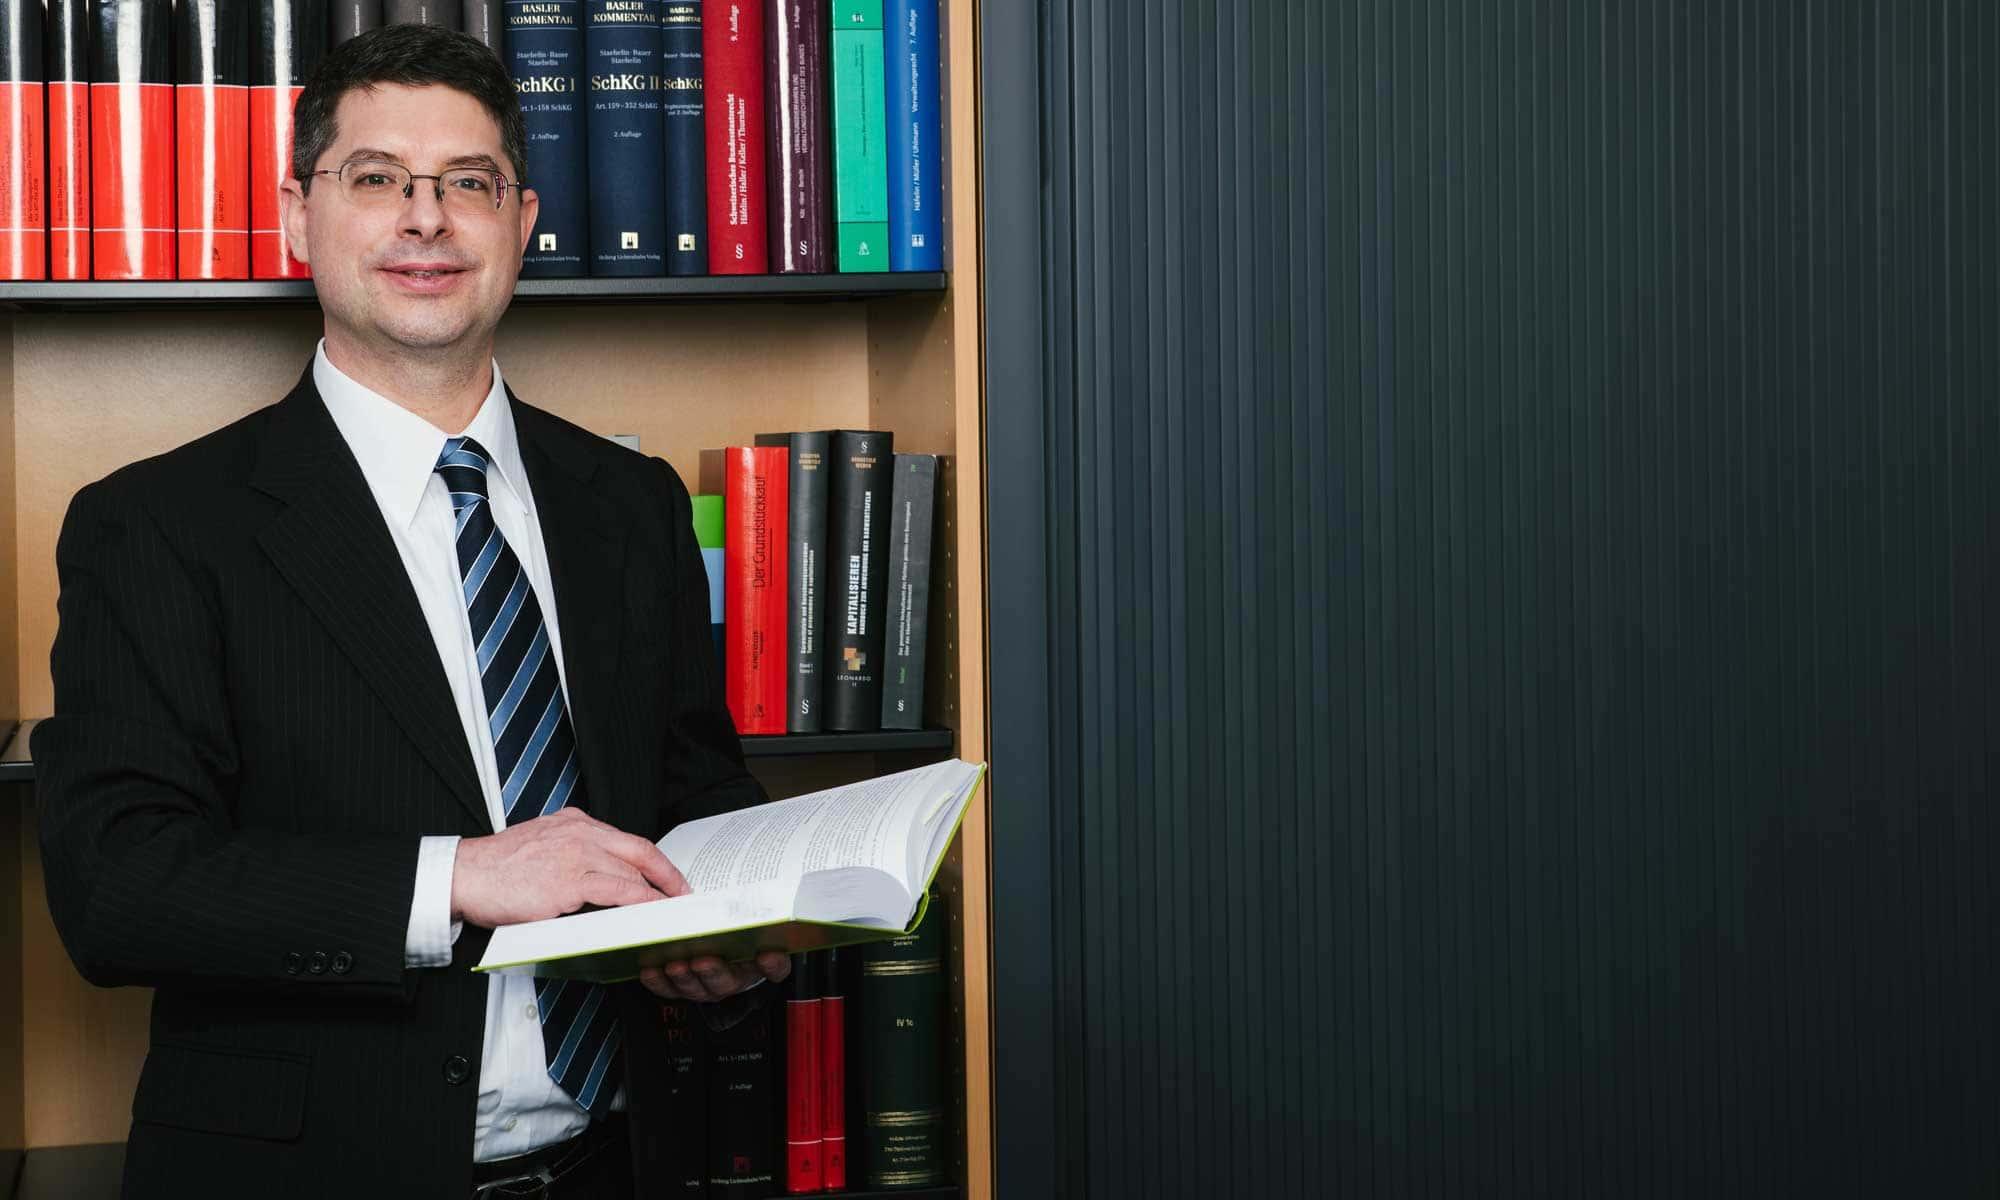 Dr. iur. Lorenz Strebel